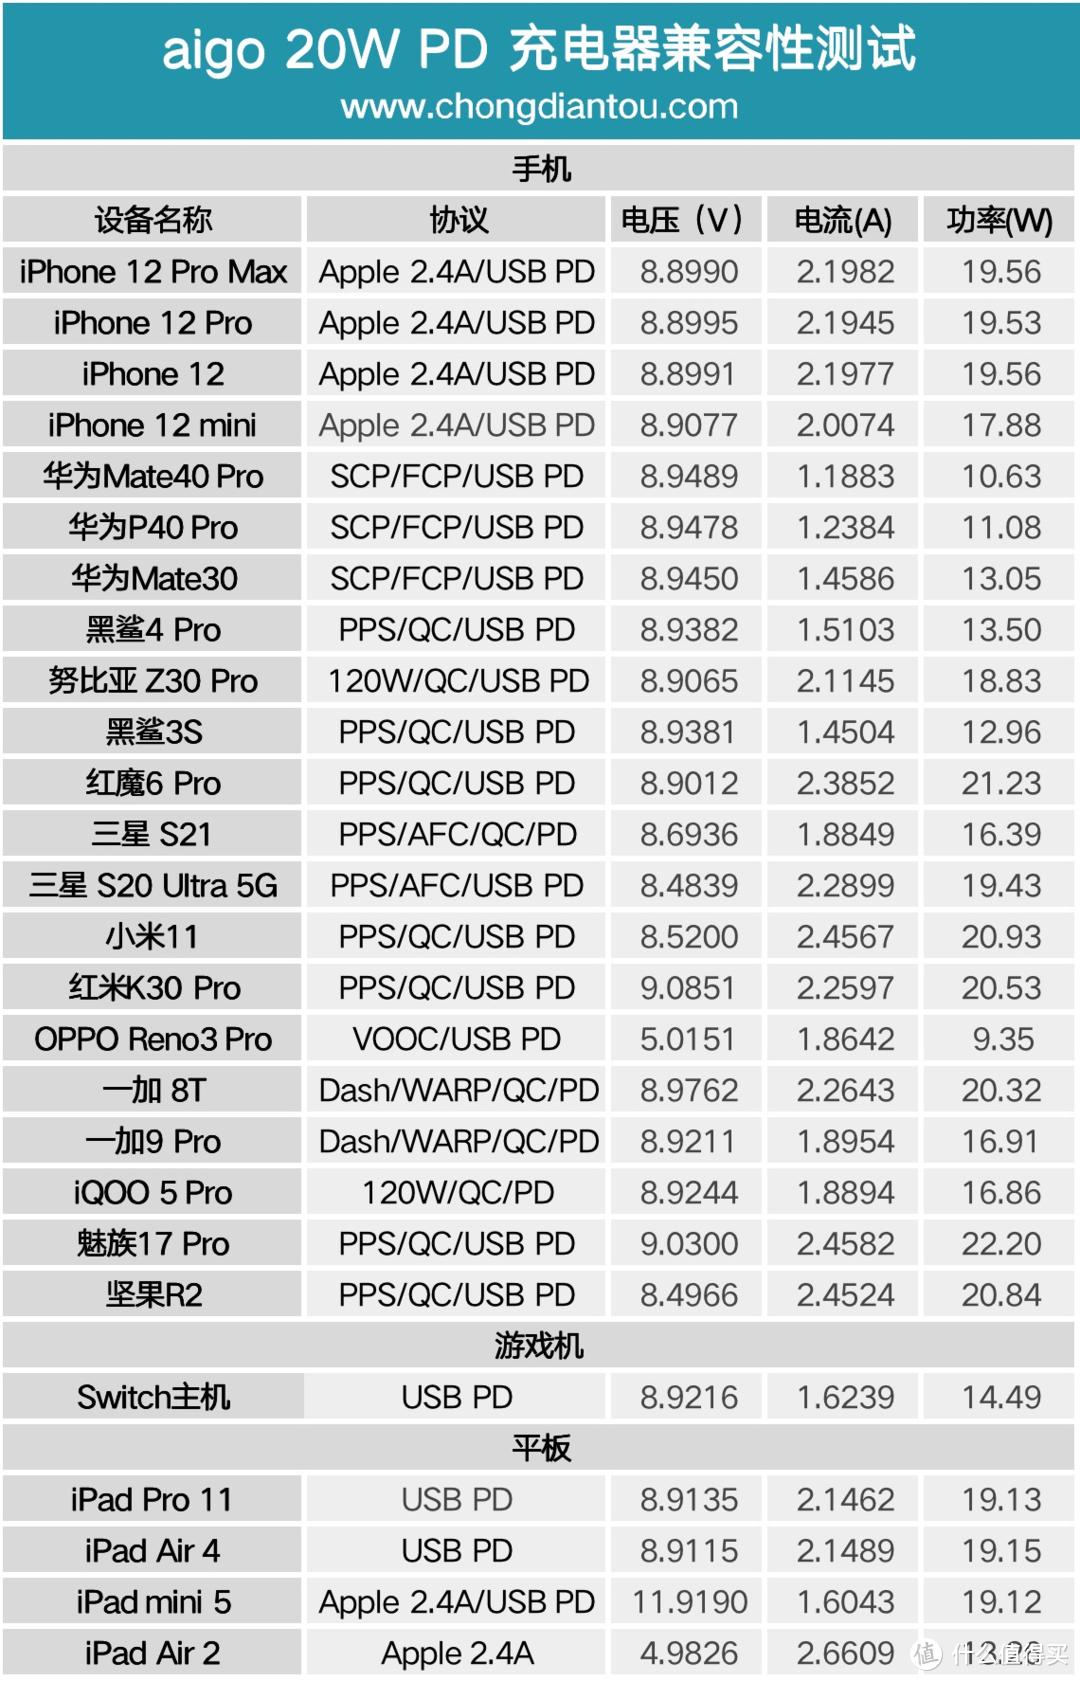 支持 iPhone 12 20W 快充,aigo 充电器 20W 快充版评测